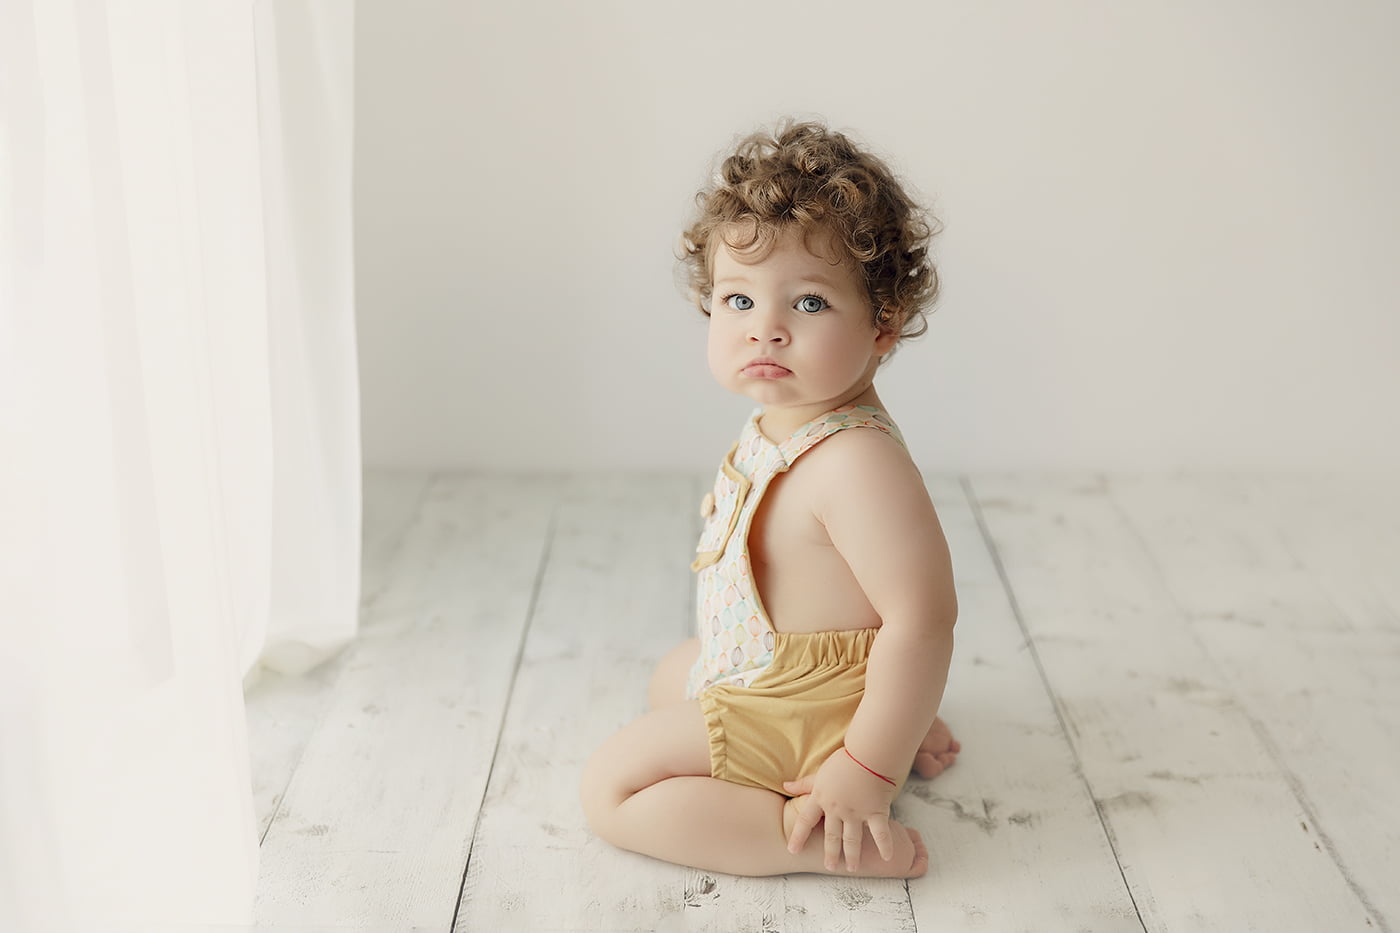 sedinta-foto-1-an-un-an-gemeni-smash-the-cake-bebe-copii-familie-fotograf-bucuresti-madalina-vasile-mvphotography